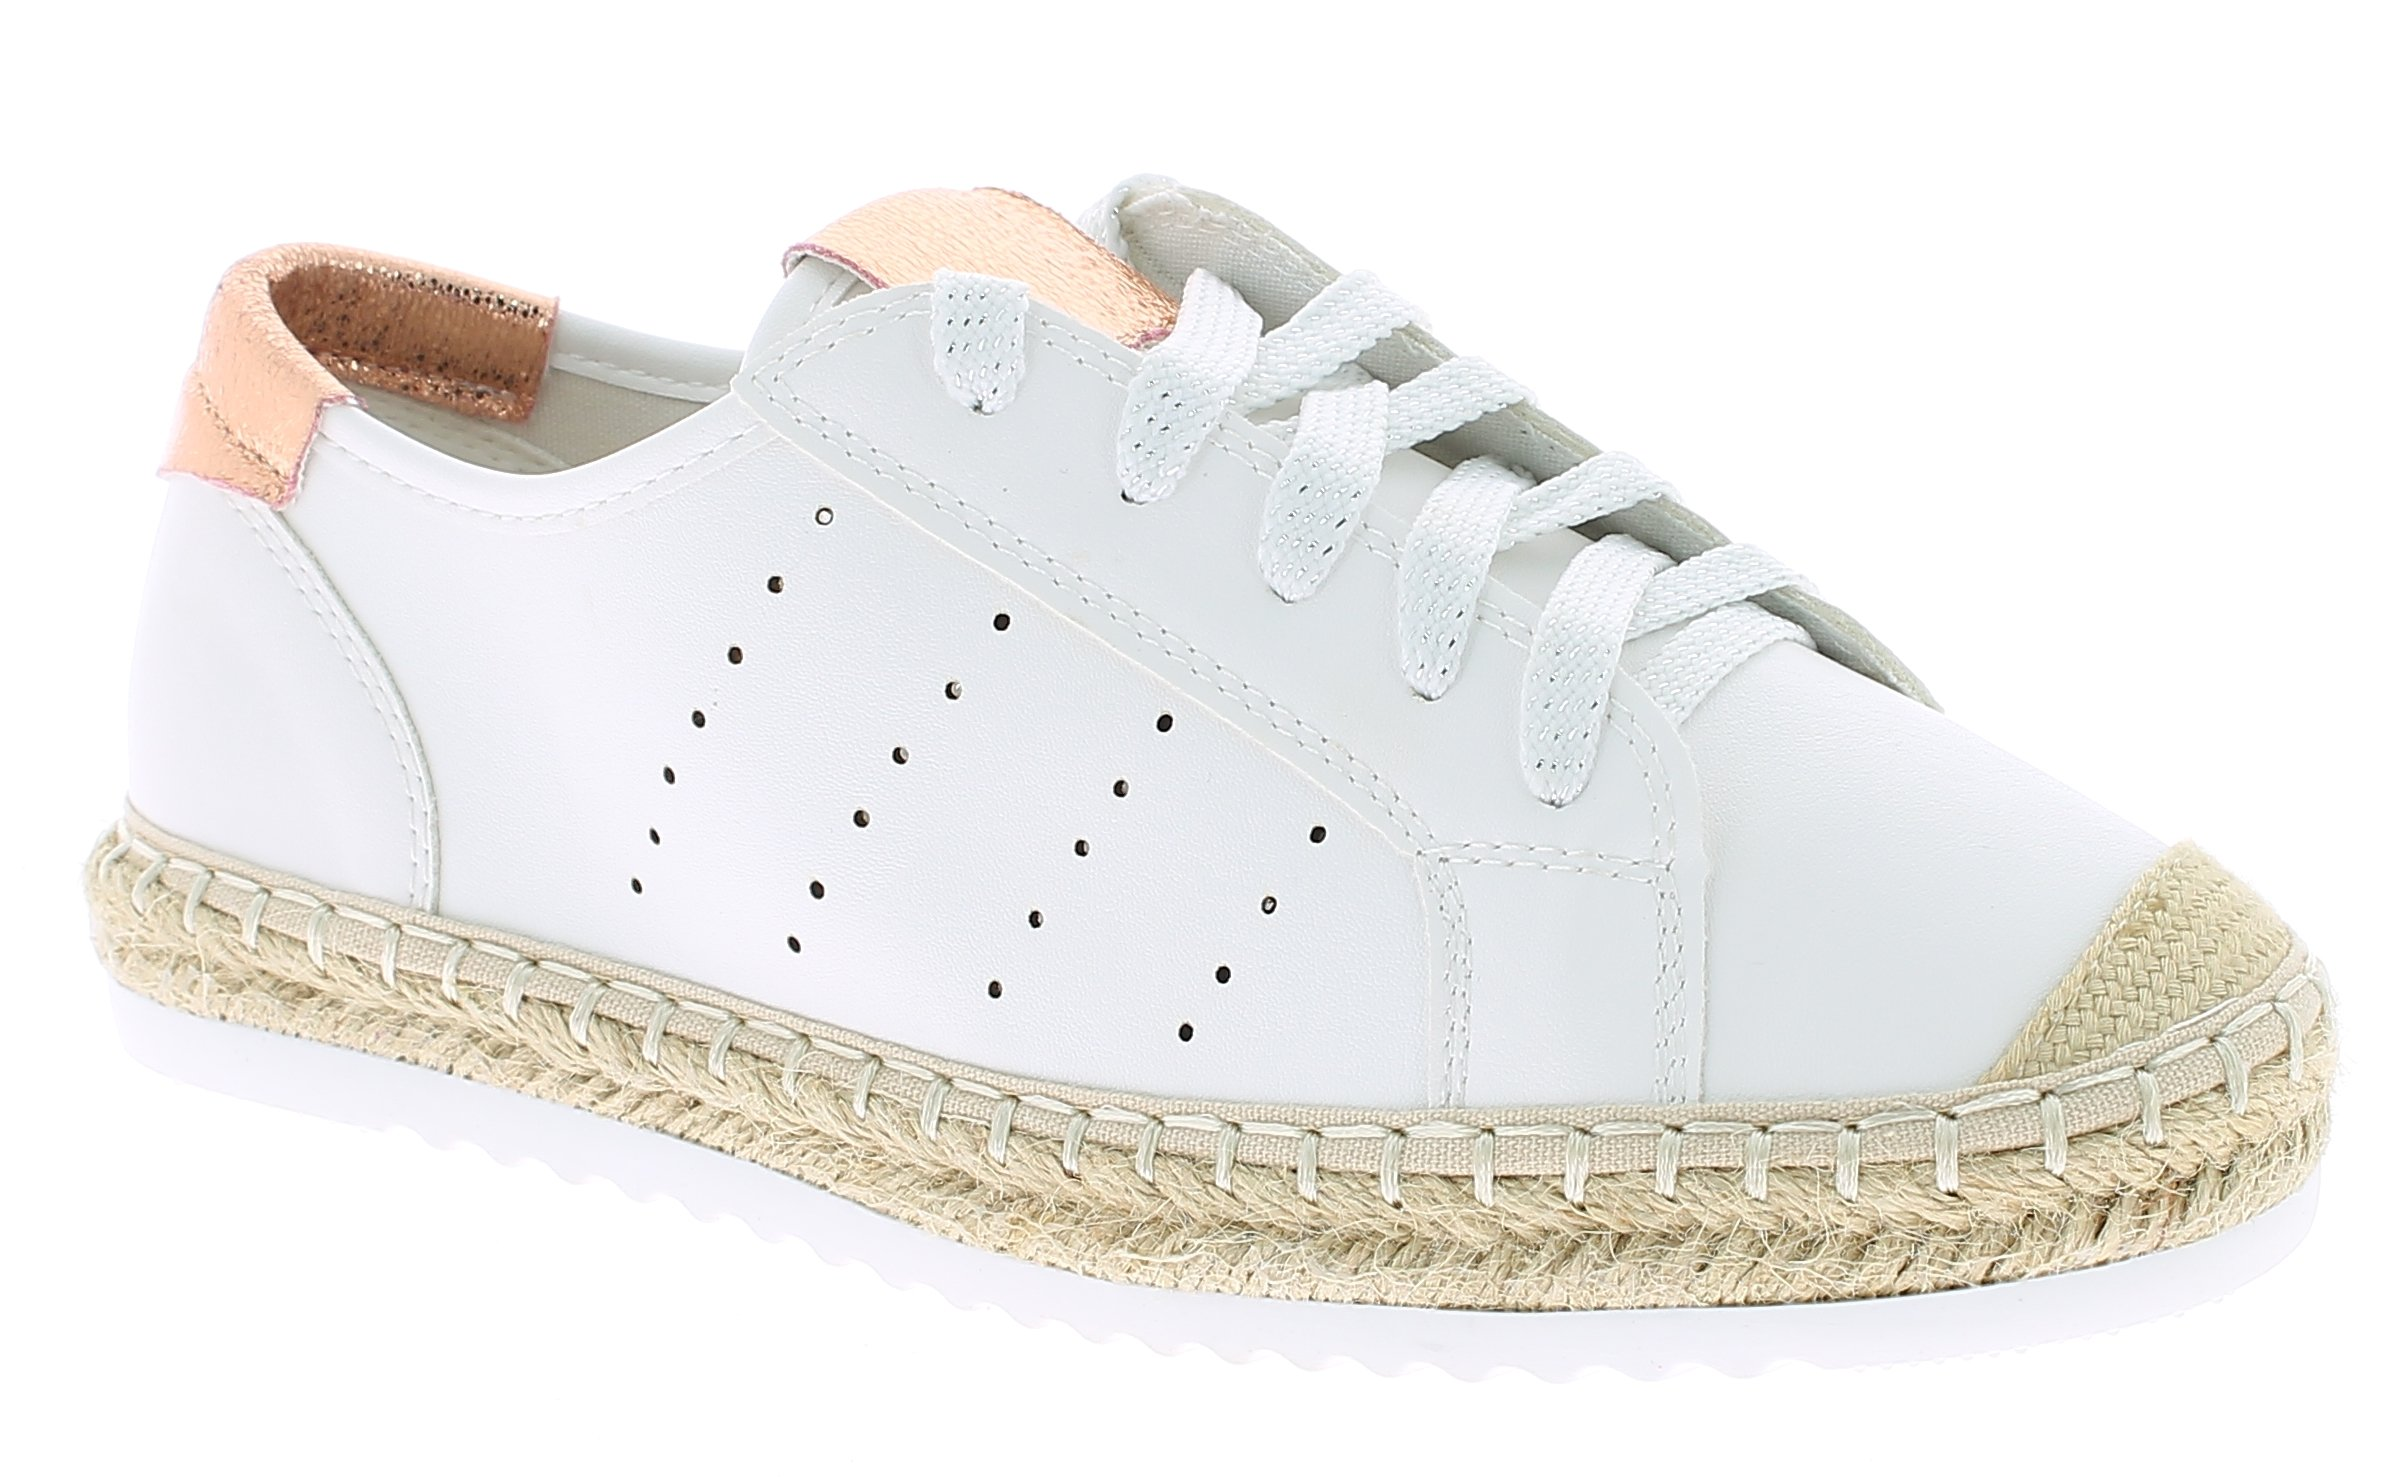 IQSHOES Γυναικείο Casual 3A320 Μπρονζέ - IqShoes - 3A320 BRONZE-bronze-36/1/34/7 προϊόντα παπούτσια